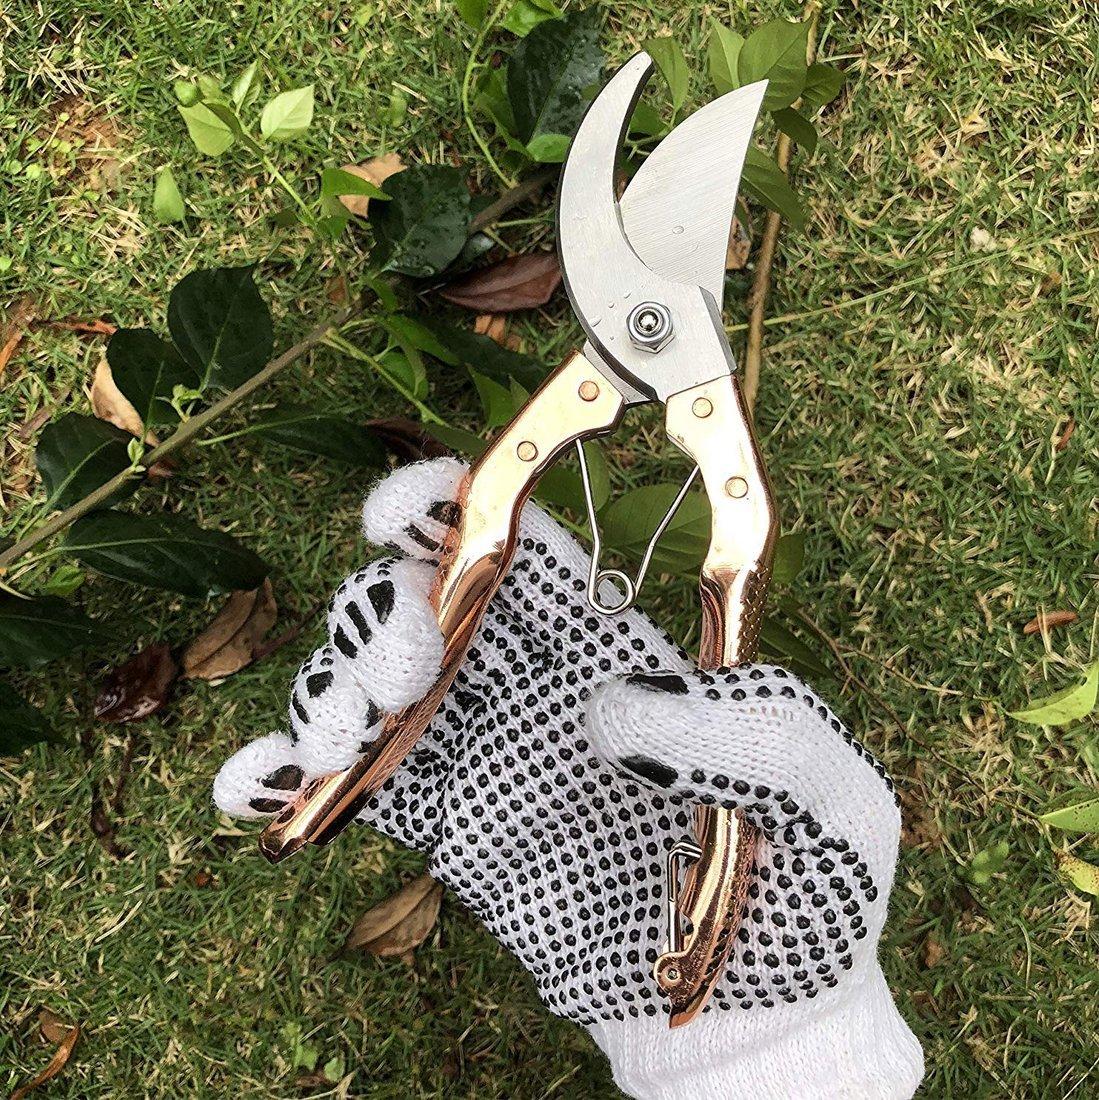 Garden Shears Pruners Scissor - Unnati Enterprises